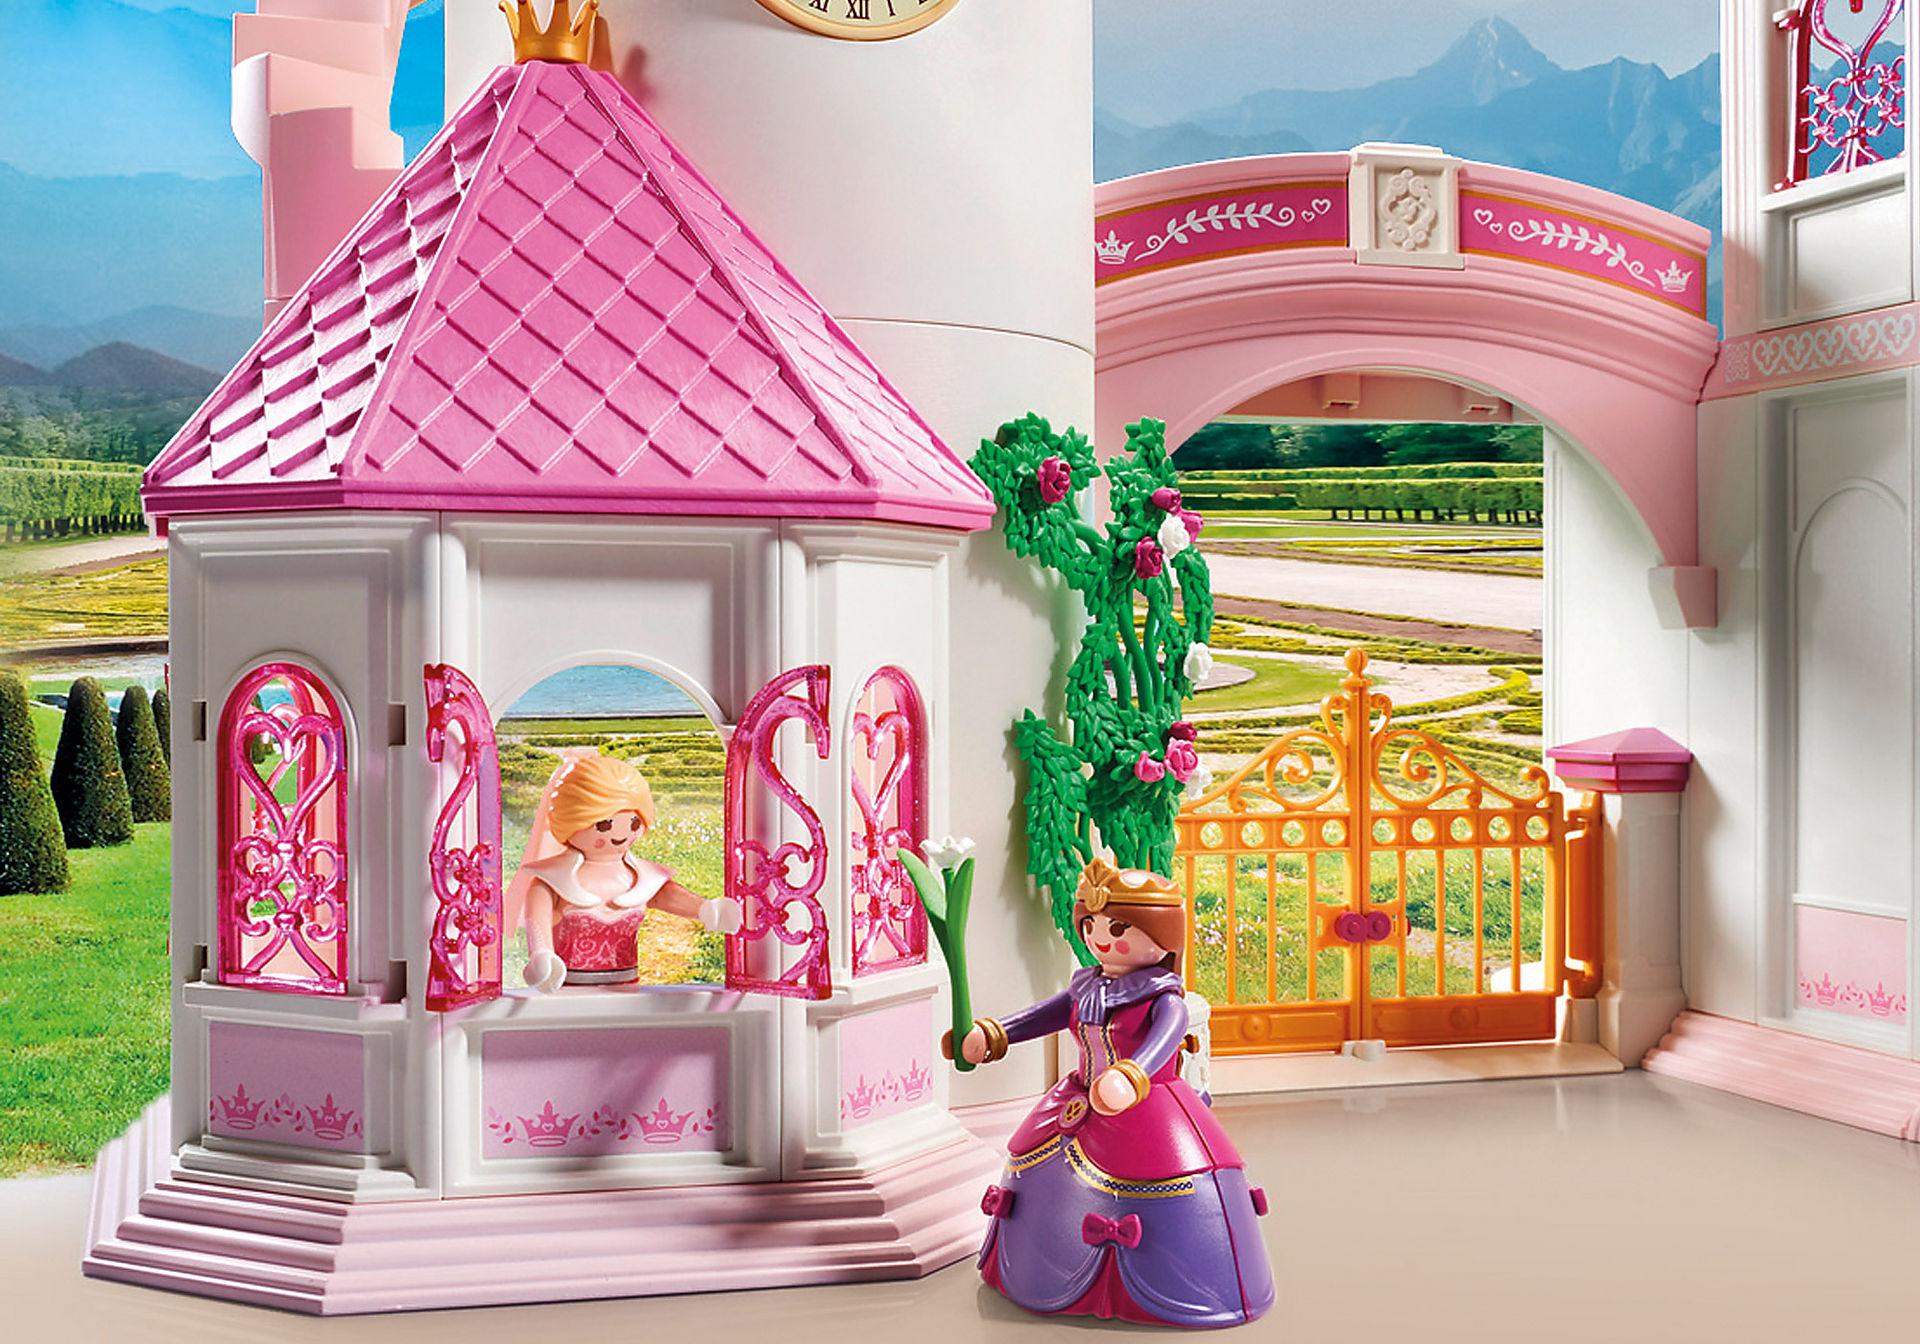 70447 Large Princess Castle zoom image4